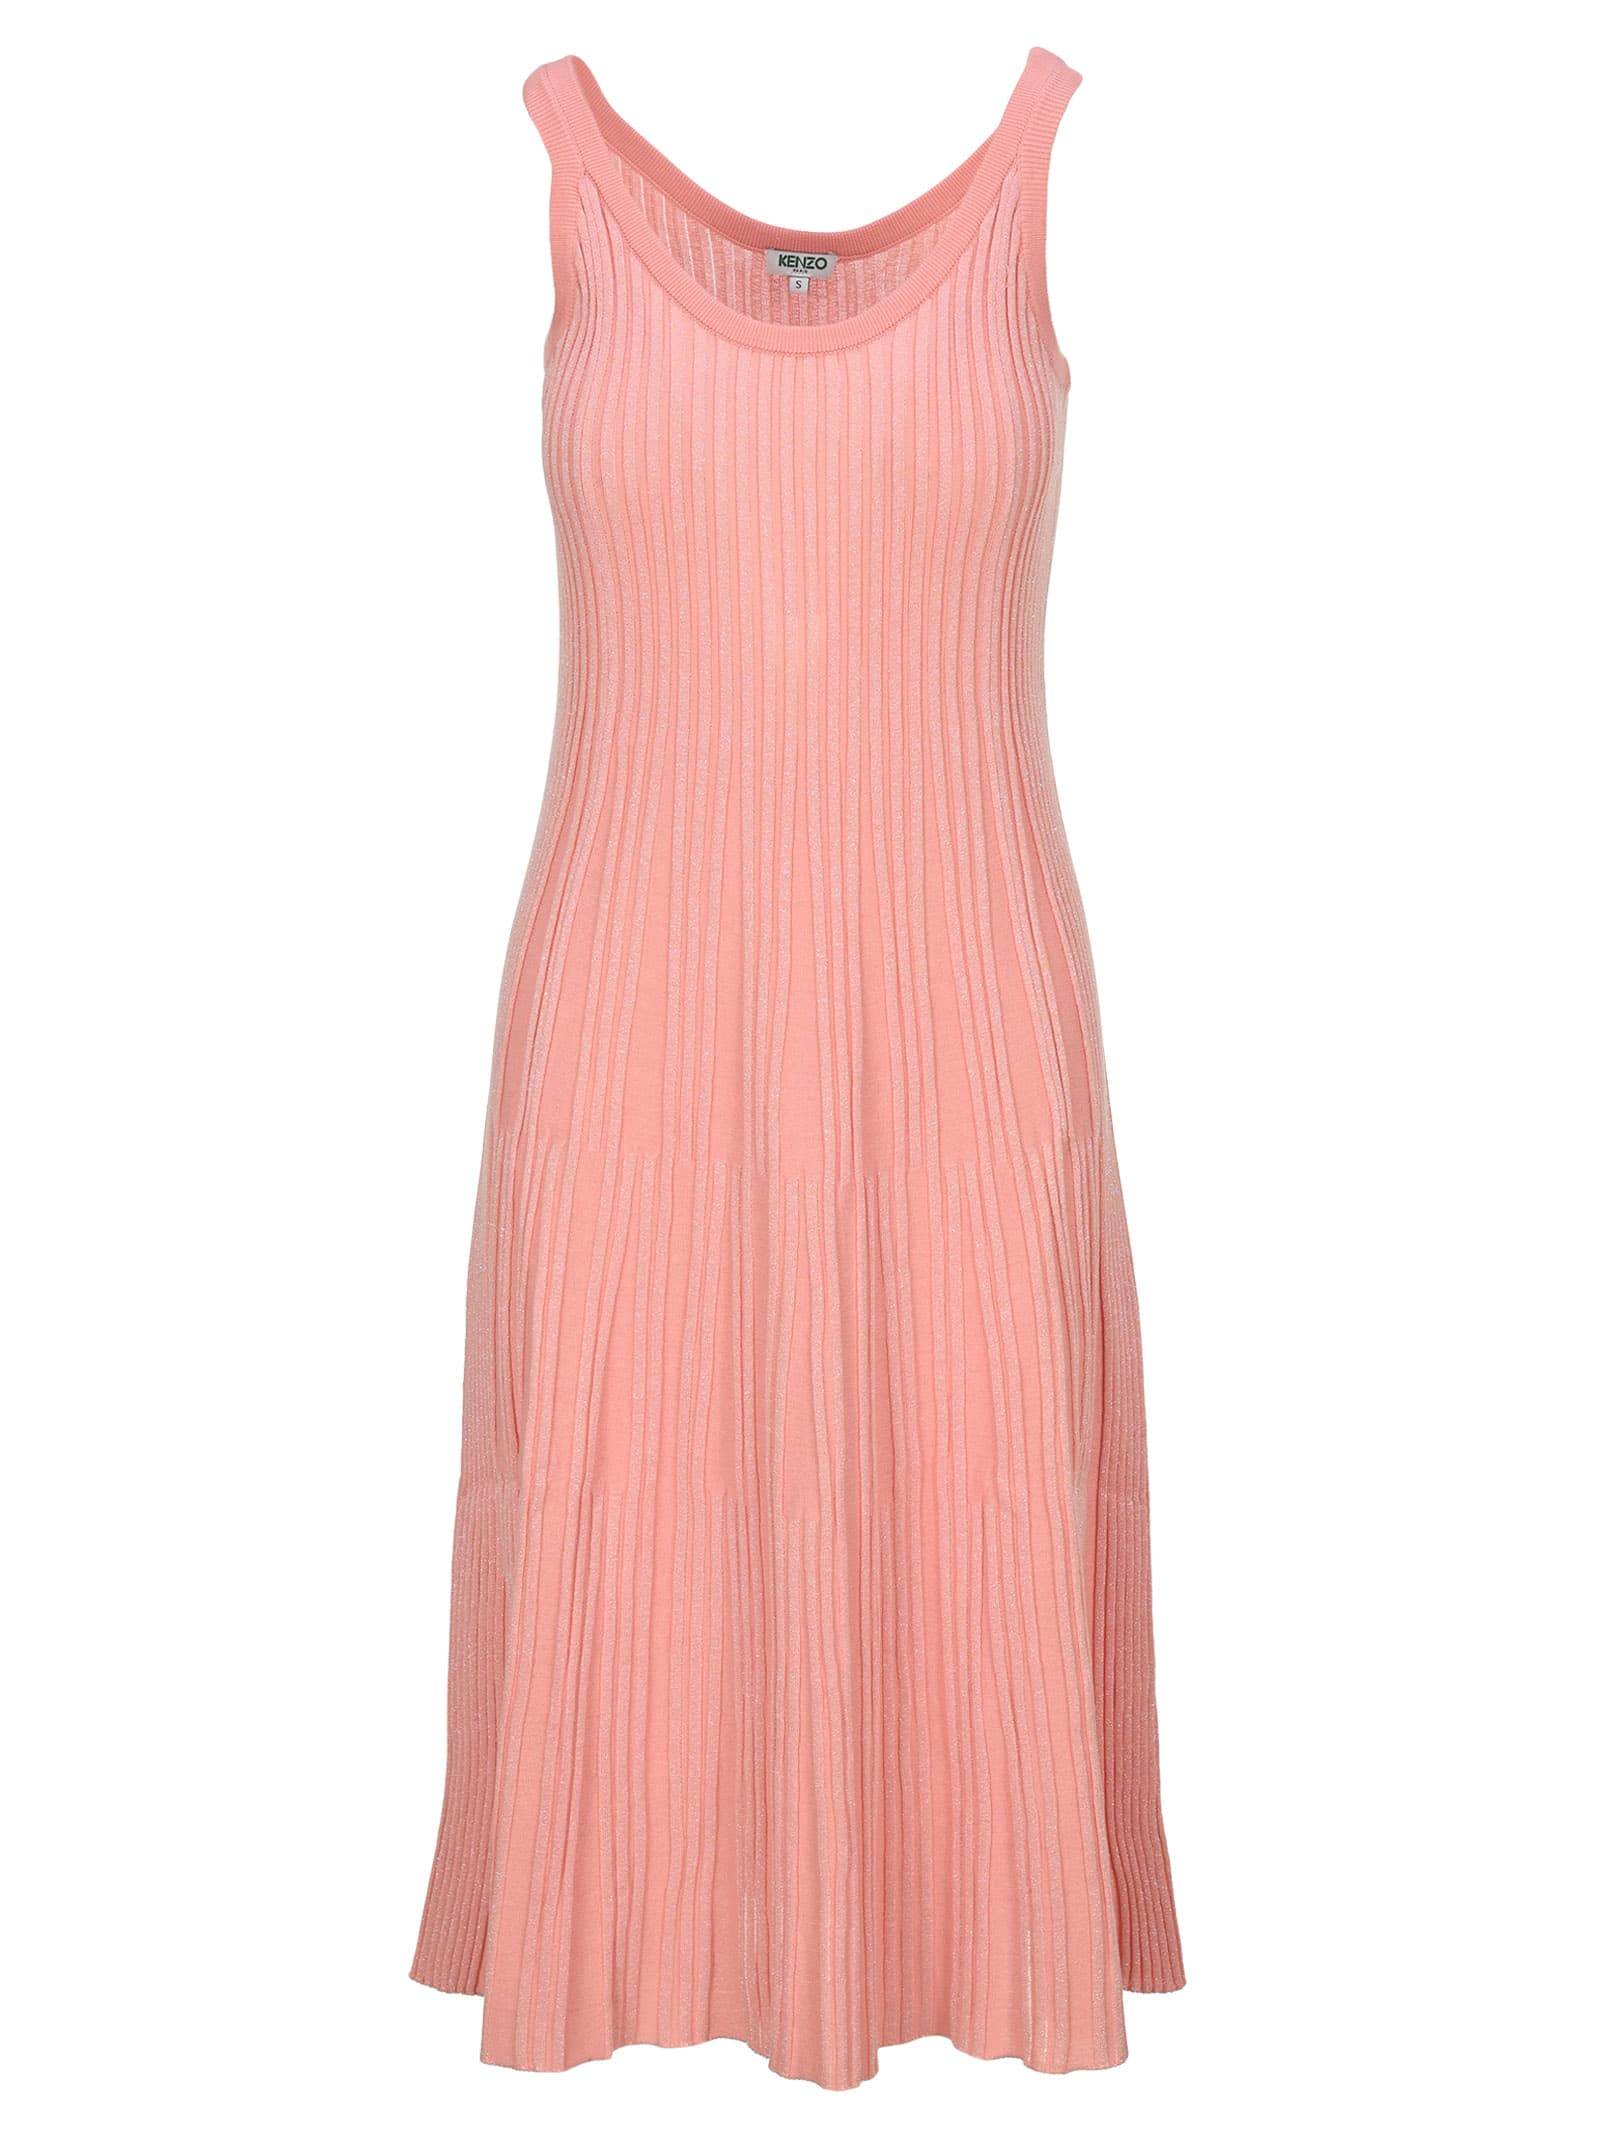 Buy Kenzo Knit Midi Dress online, shop Kenzo with free shipping